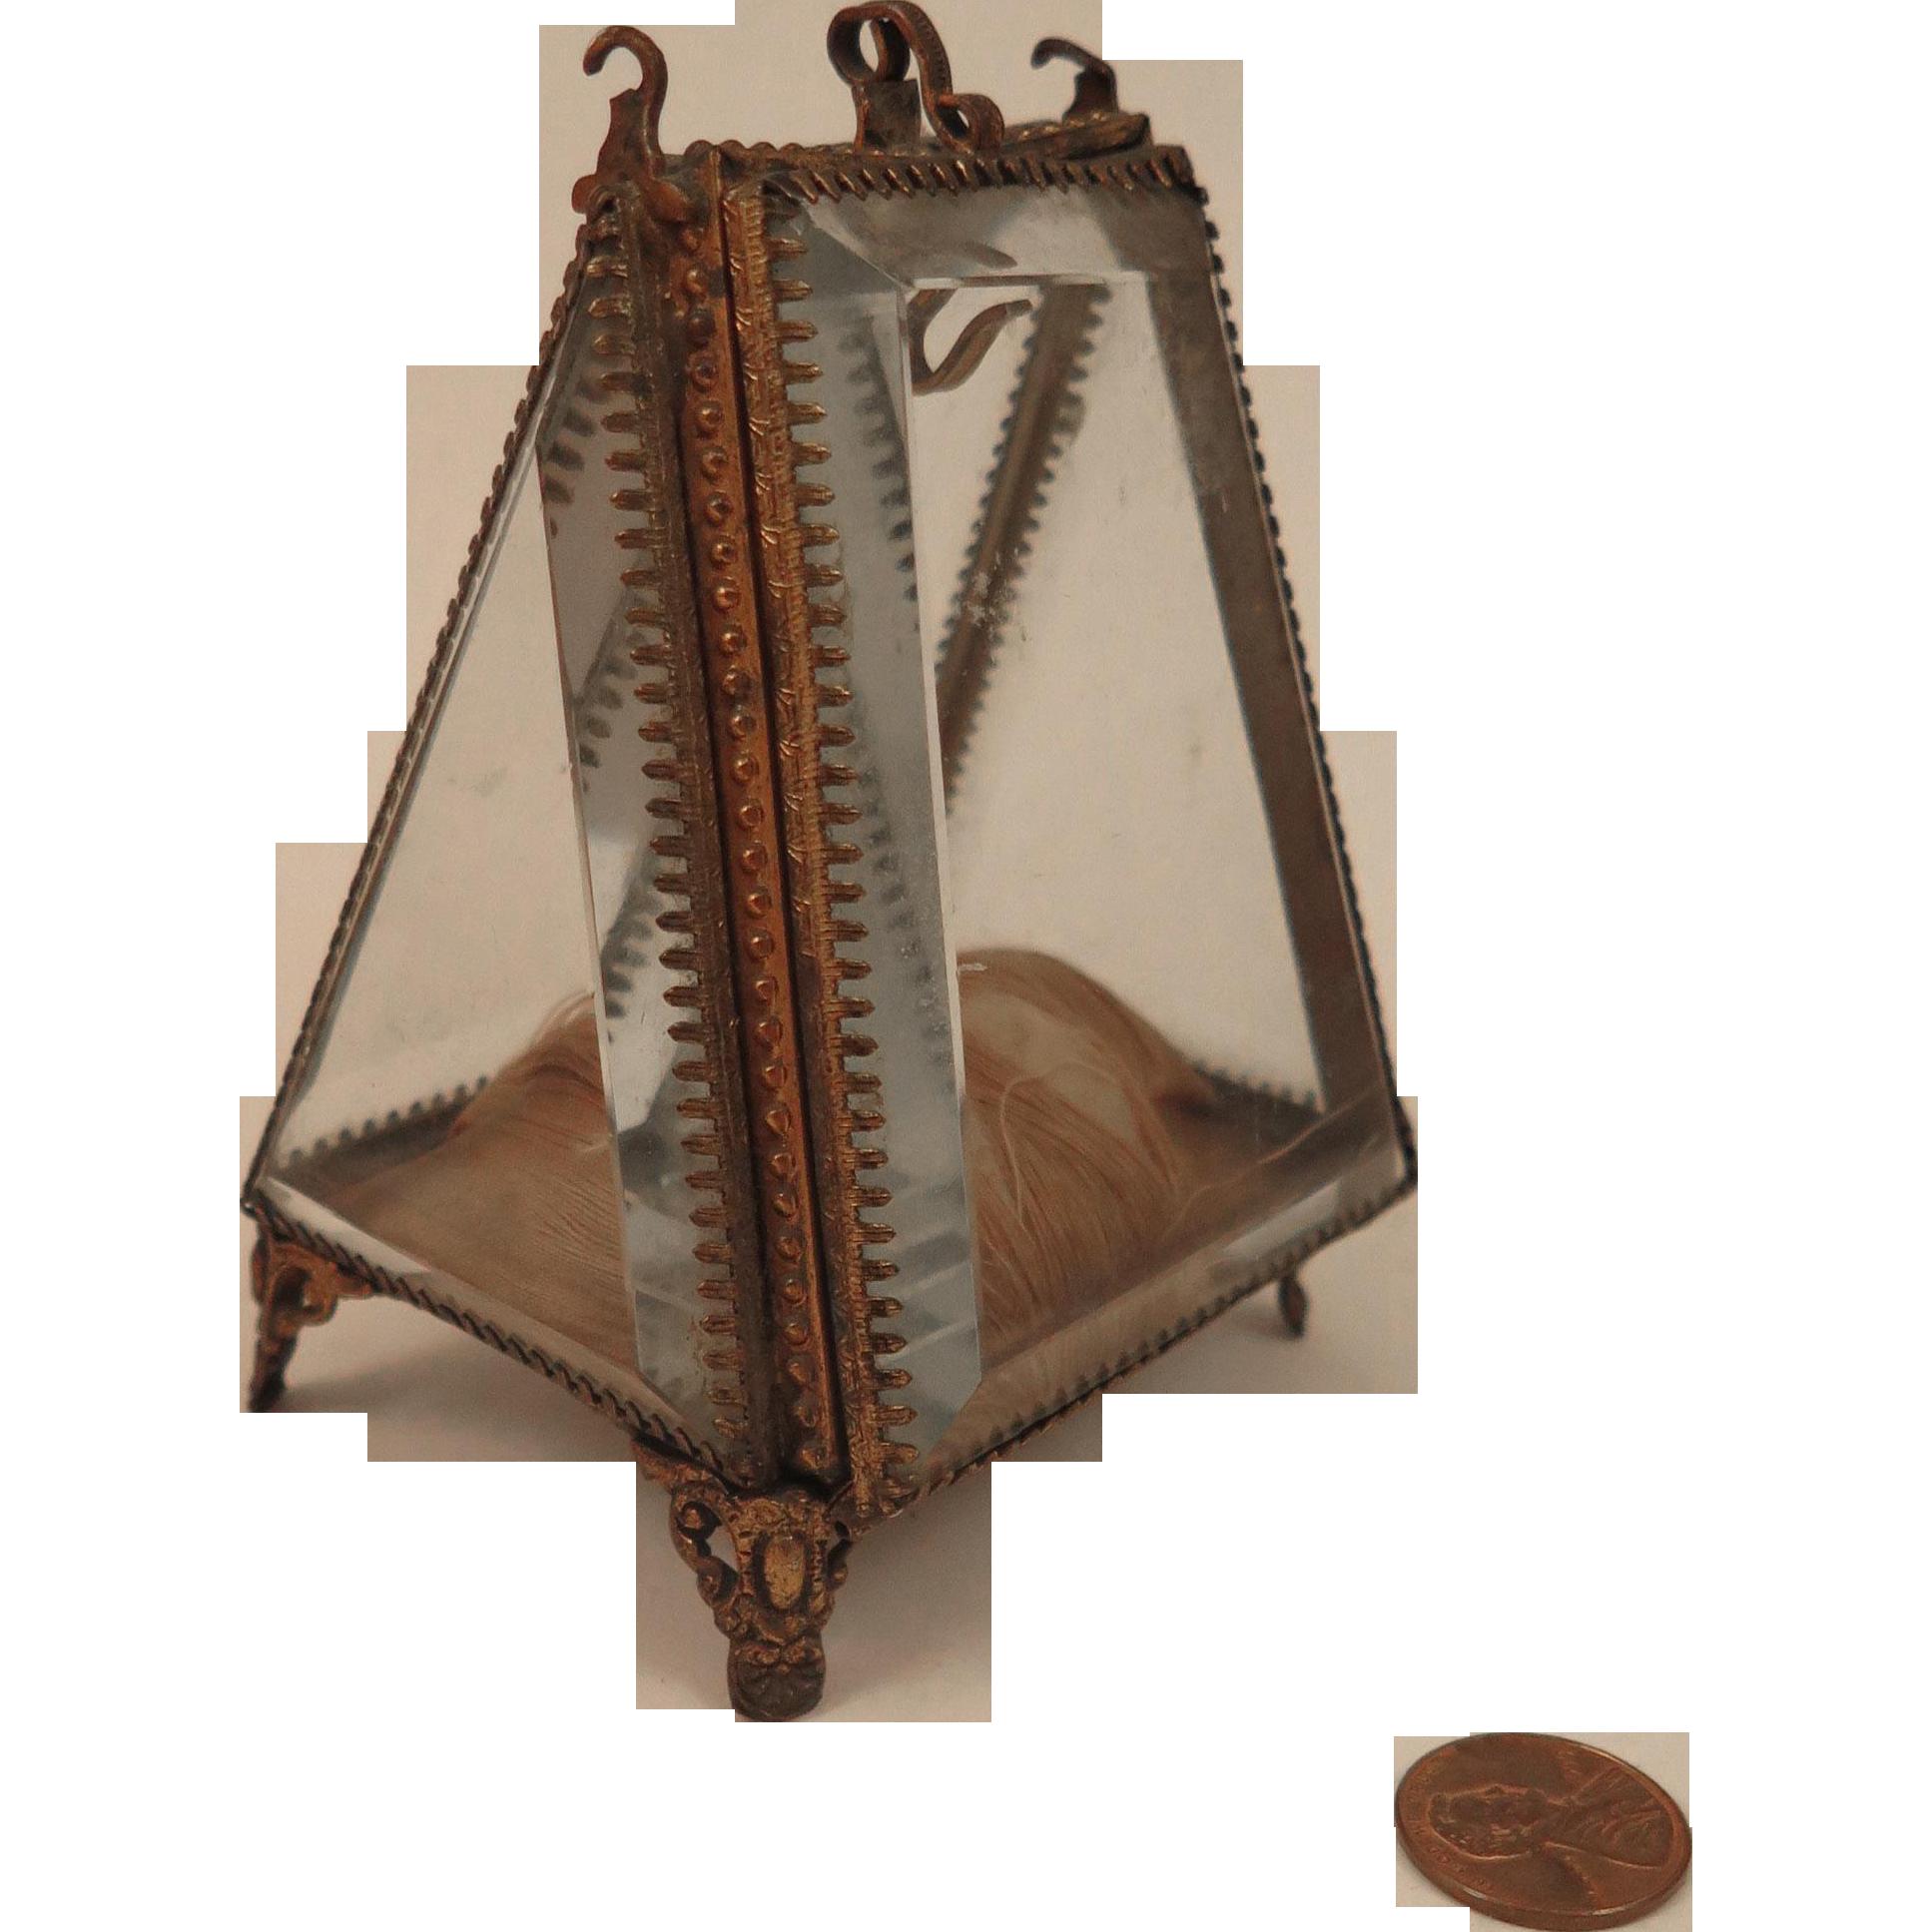 Antique Ormolu Beveled Glass Watch Jewelry Box